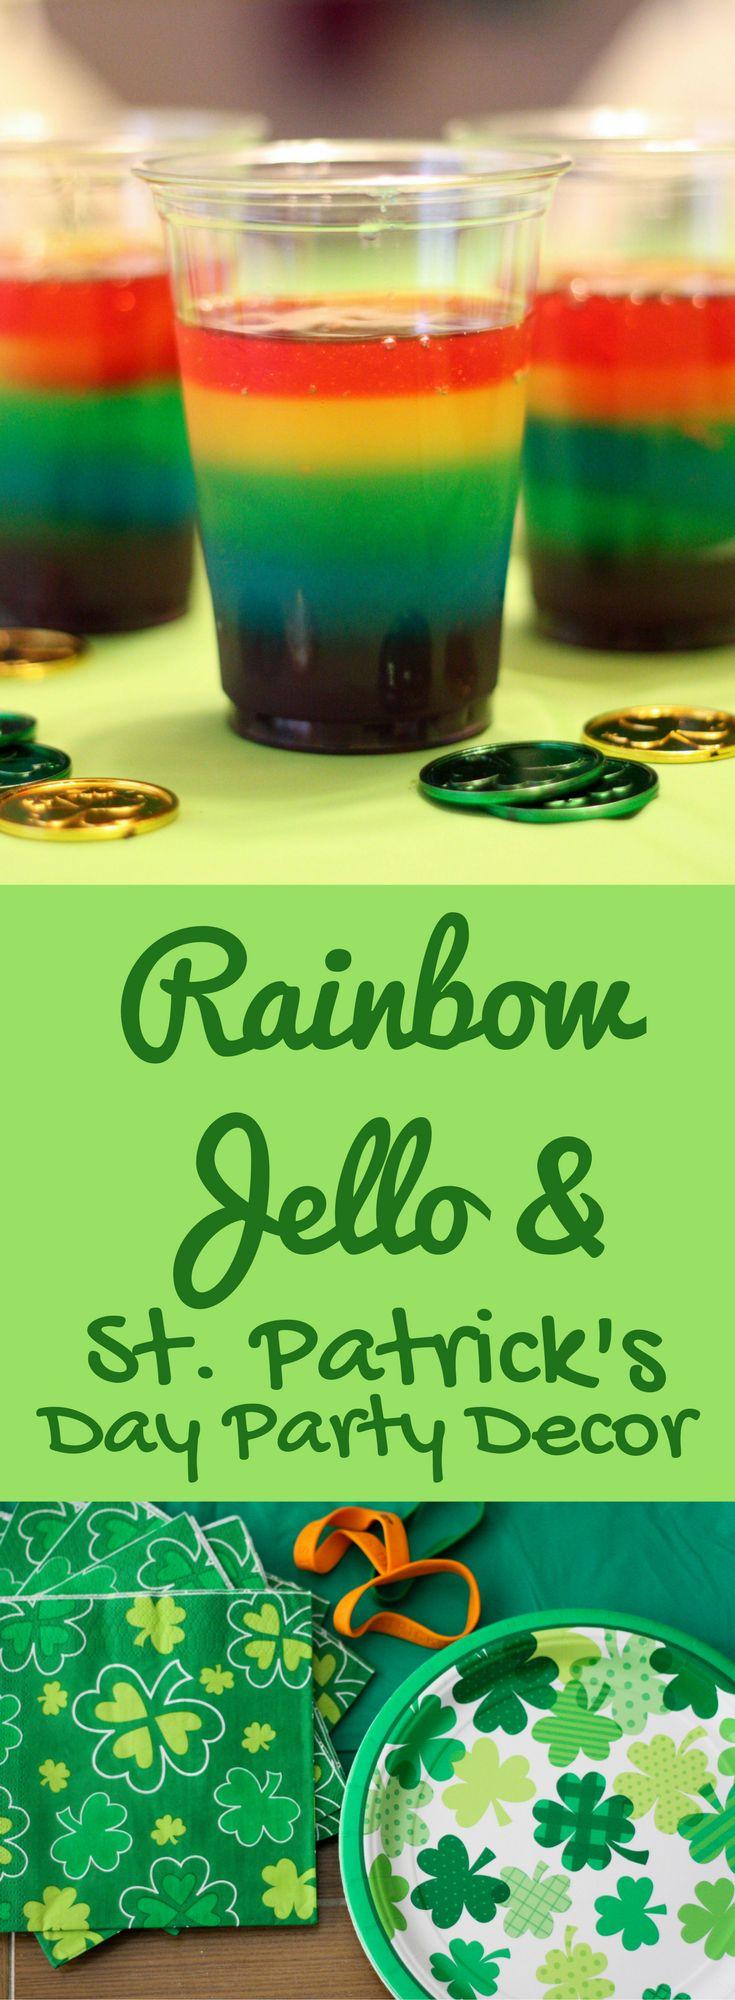 Rainbow Jello and St. Patrick's Day Party Decor